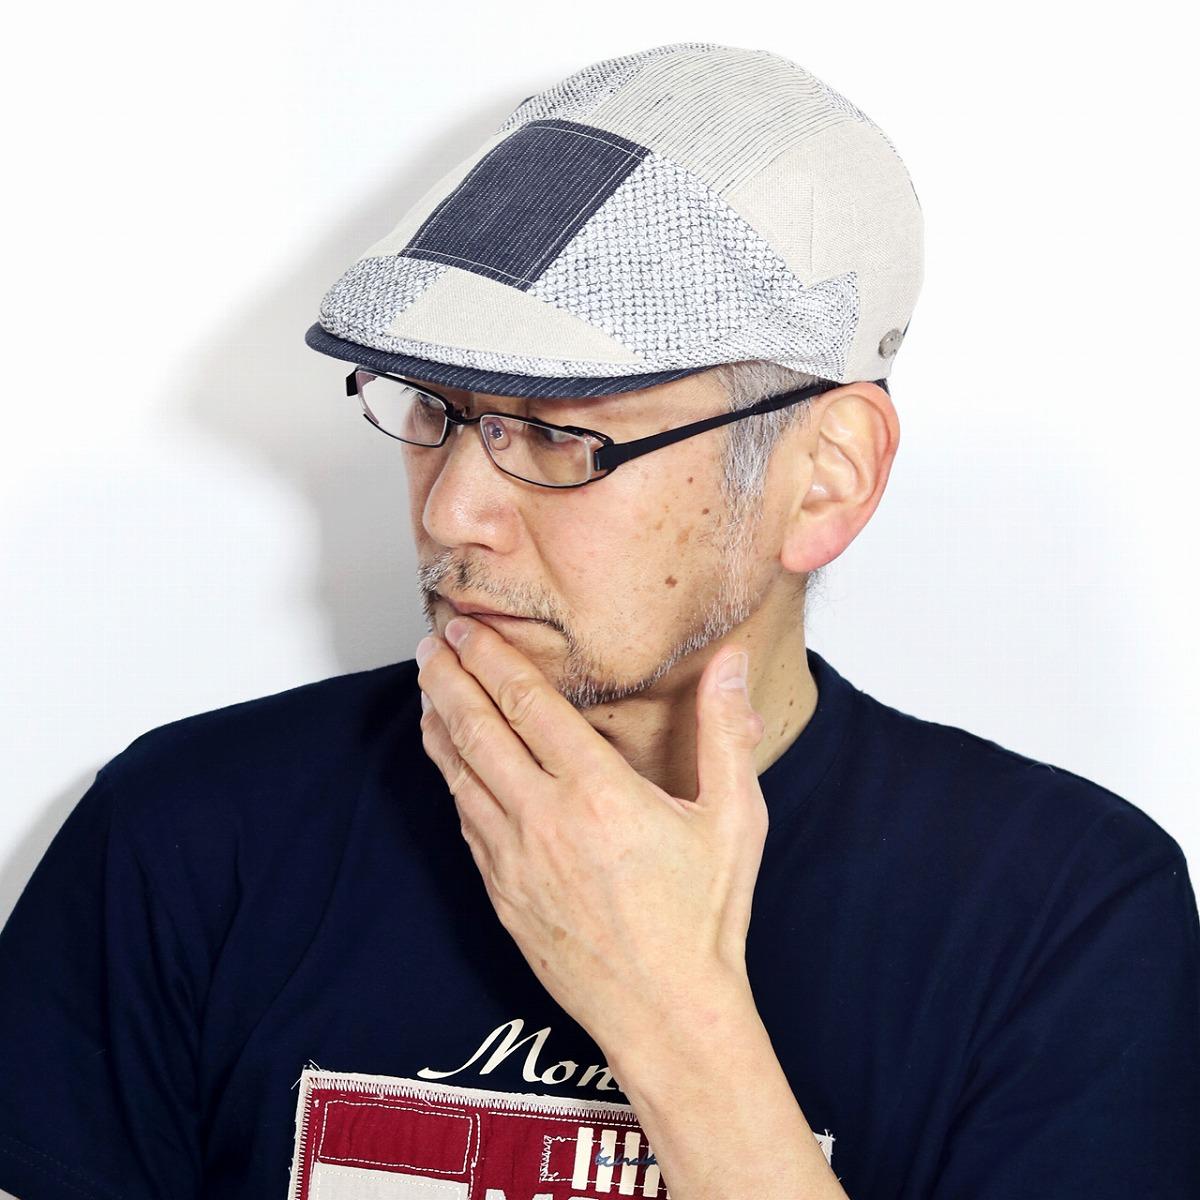 DAKS パッチワーク ハンチング ダックス 春 夏 帽子 メンズ ラッセル編み ストライプ すべりサイズ調整 ハンチング帽 紳士 56.5cm 58cm 59.5cm M L XL 50代 60代 70代 ファッション カジュアル / グレー[ ivy cap ]男性 誕生日 帽子 父の日 ギフト プレゼント